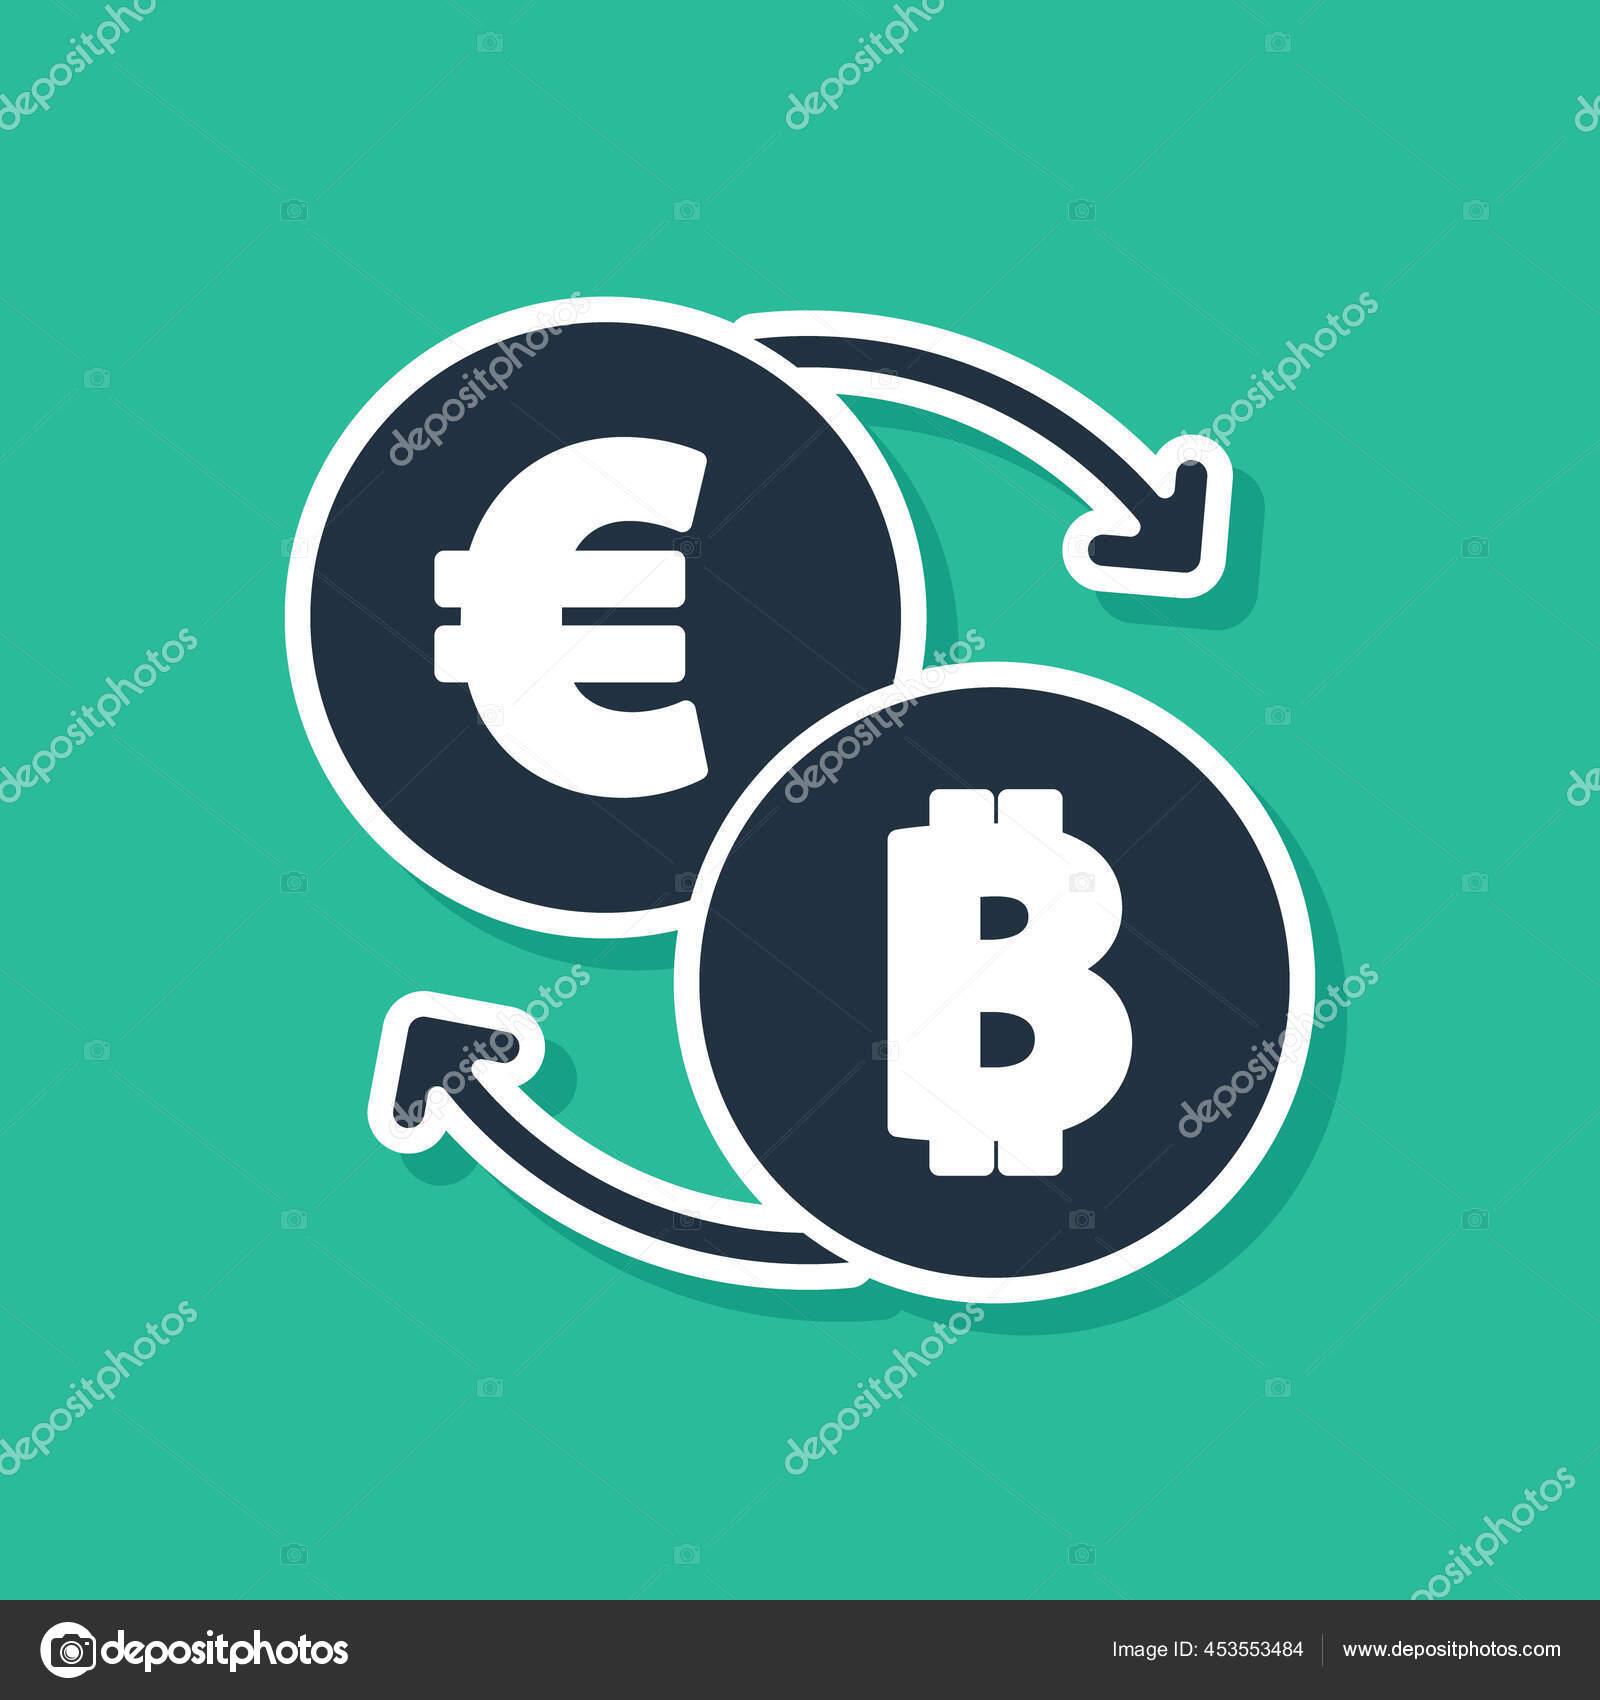 HUF to BTC Exchange Rate